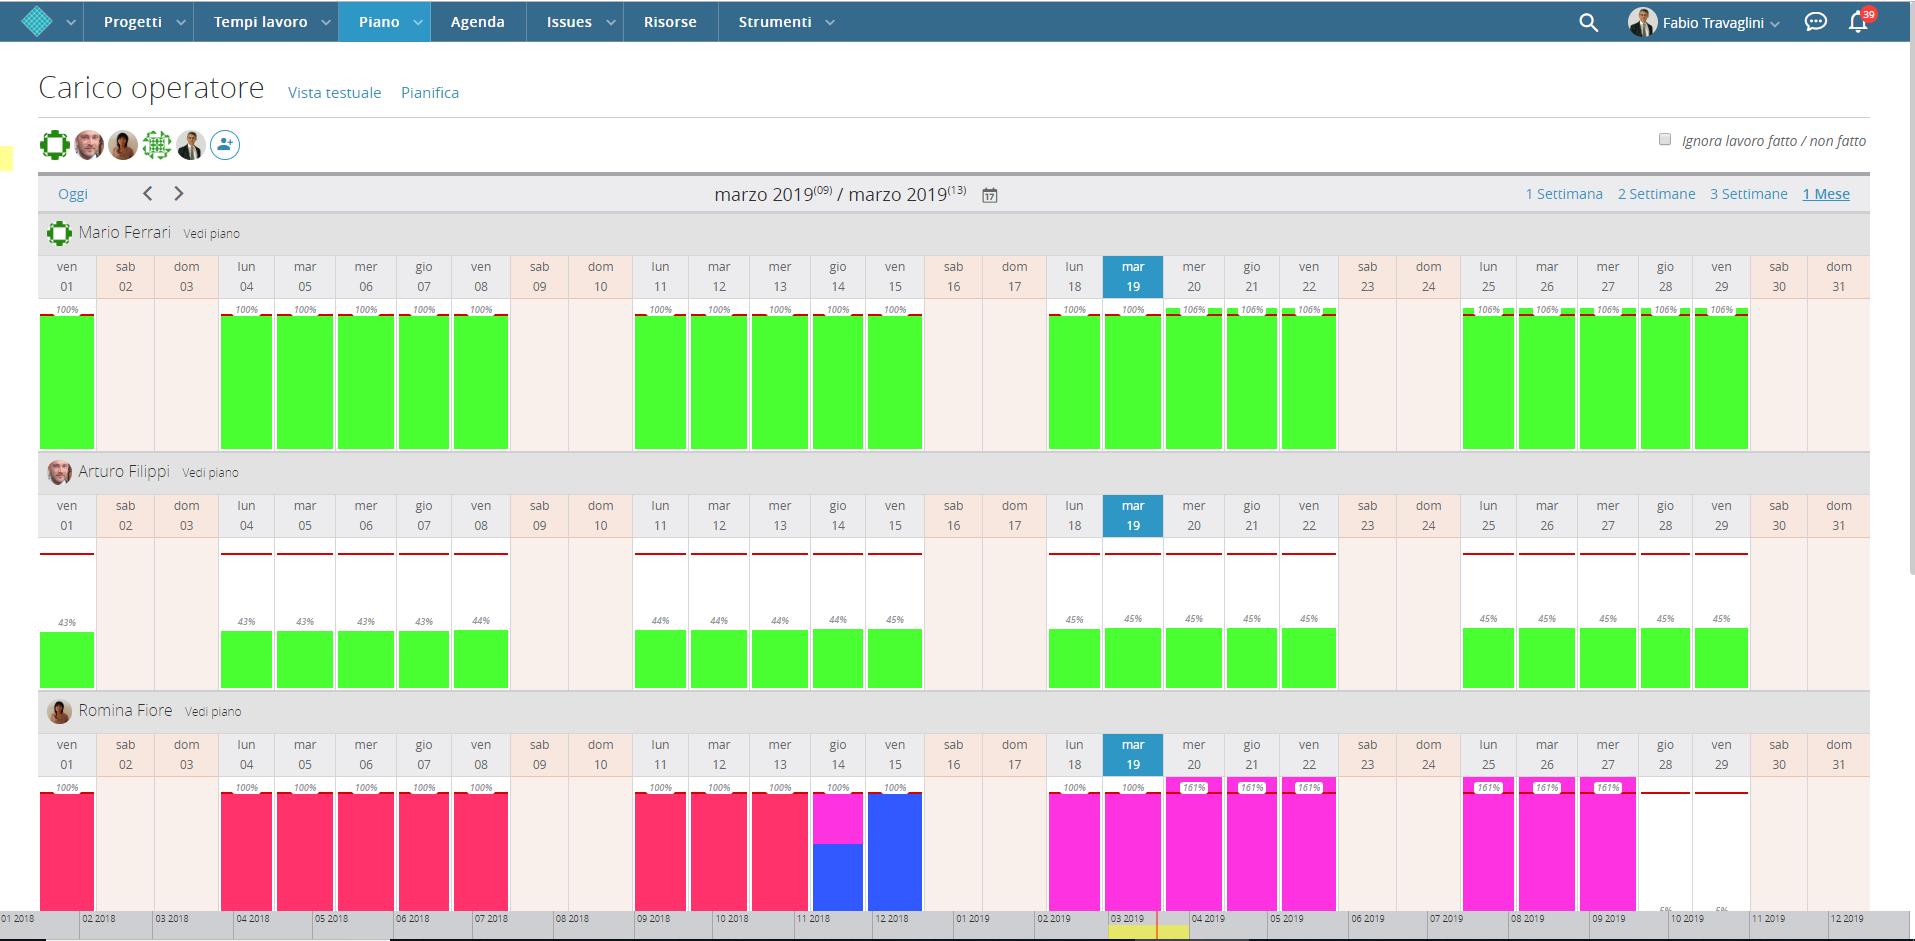 Carico_operatori software per gestione commesse